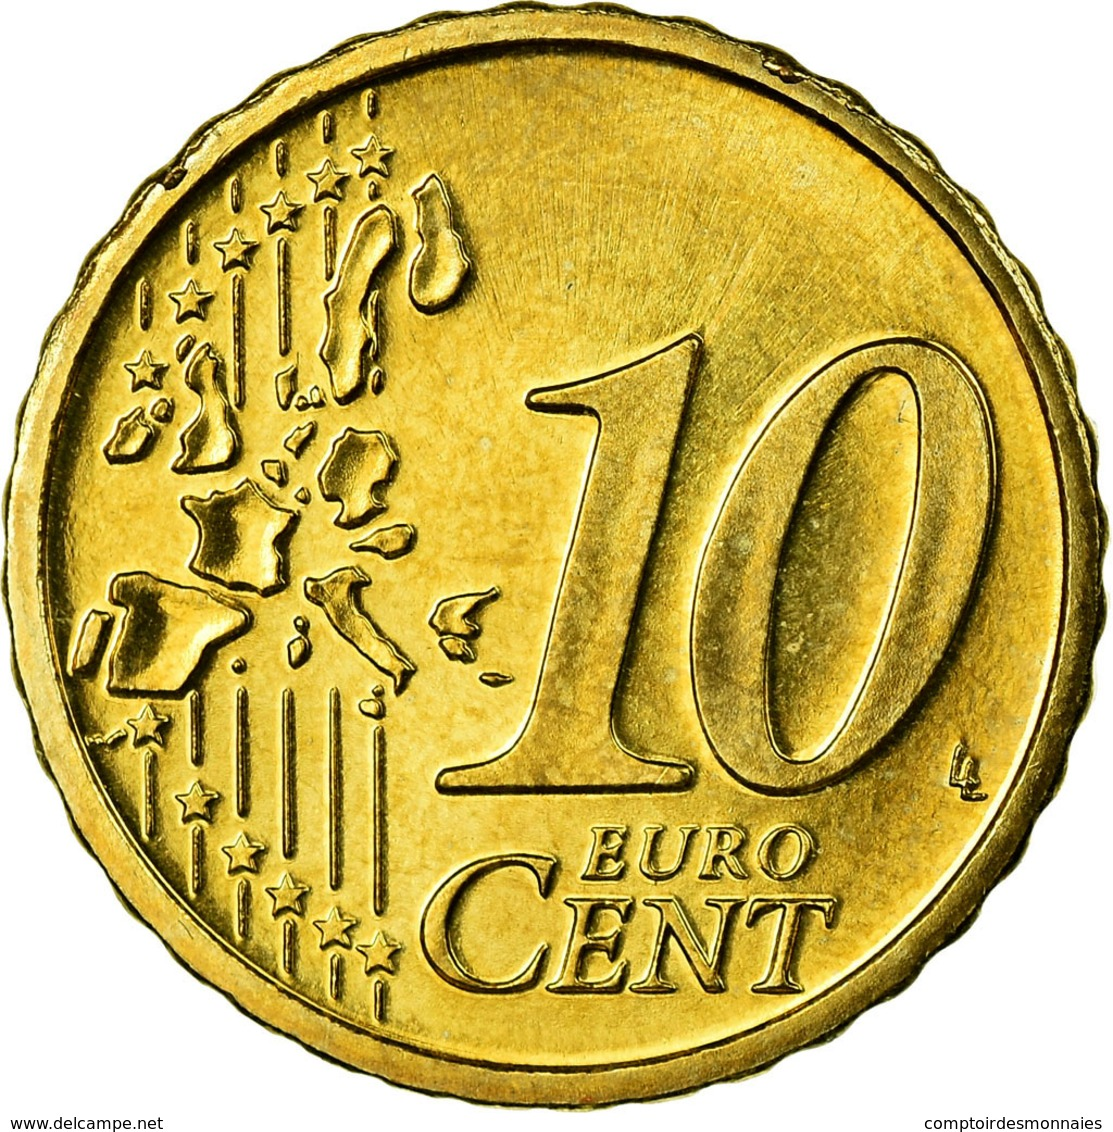 Autriche, 10 Euro Cent, 2007, SPL, Laiton, KM:3085 - Autriche